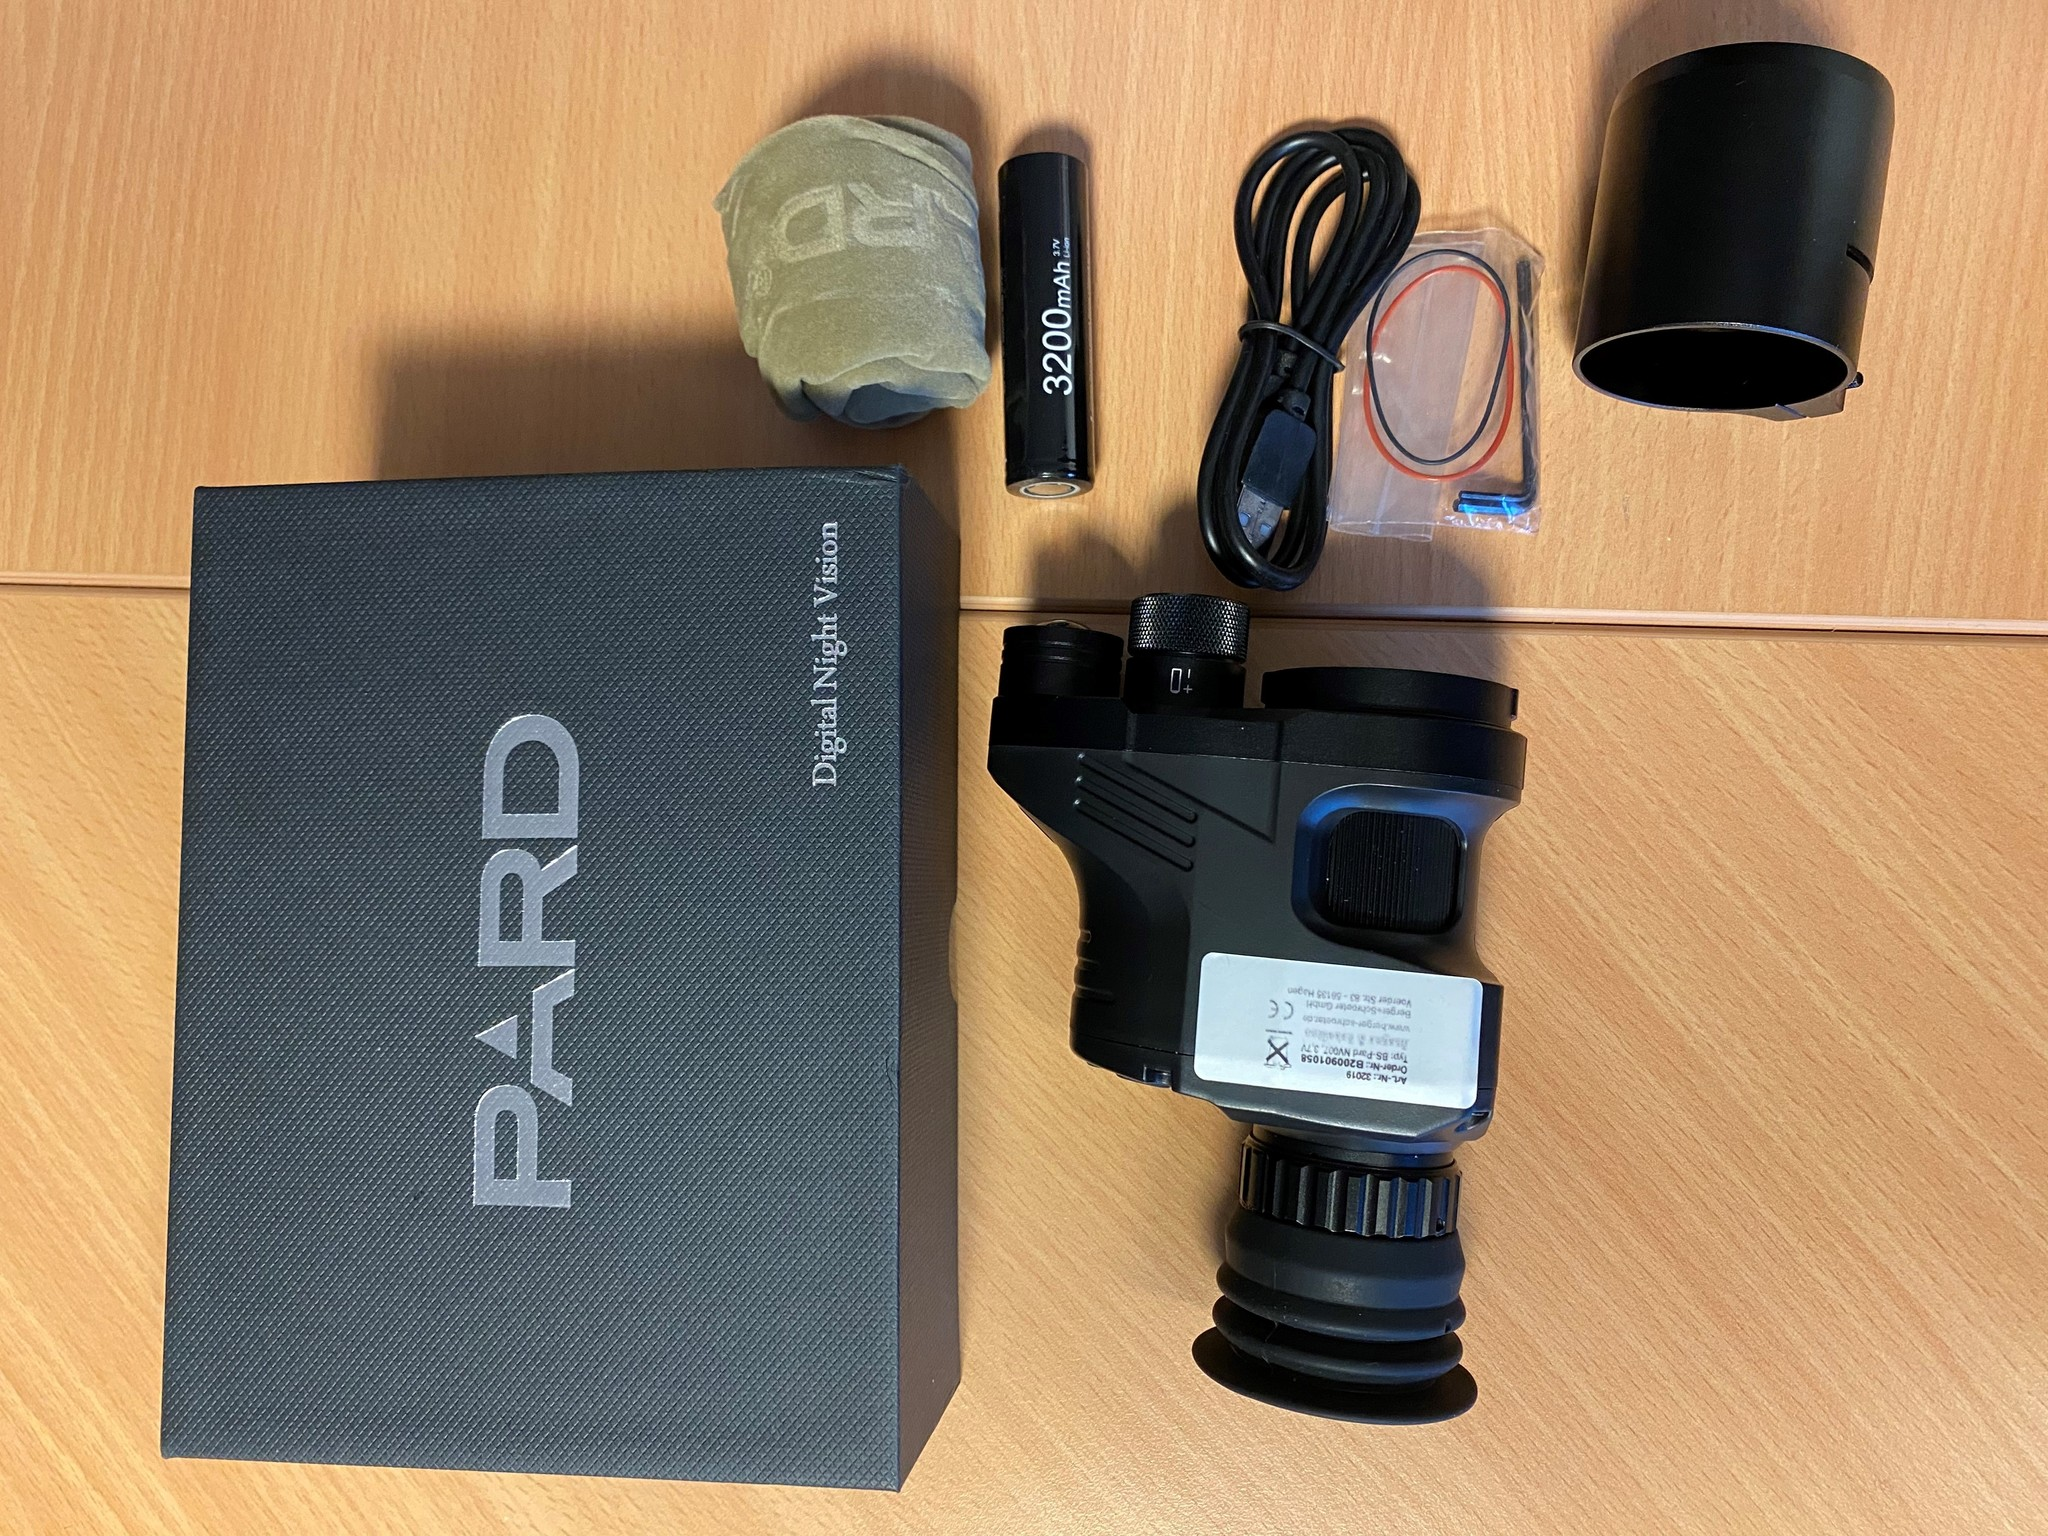 Digitales Nachtsichtgerät PARD  NV007 A